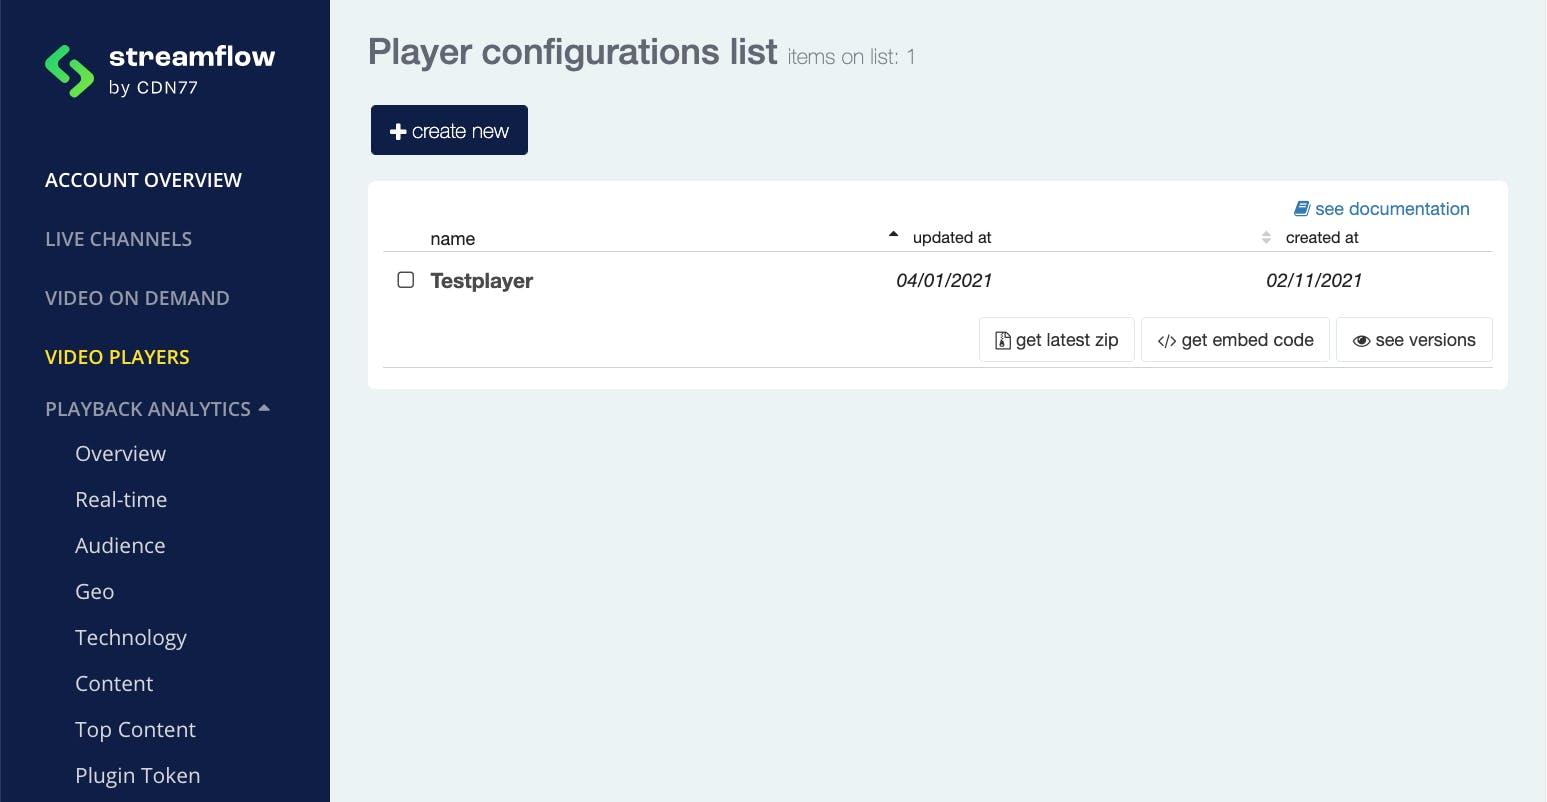 Player configuration list